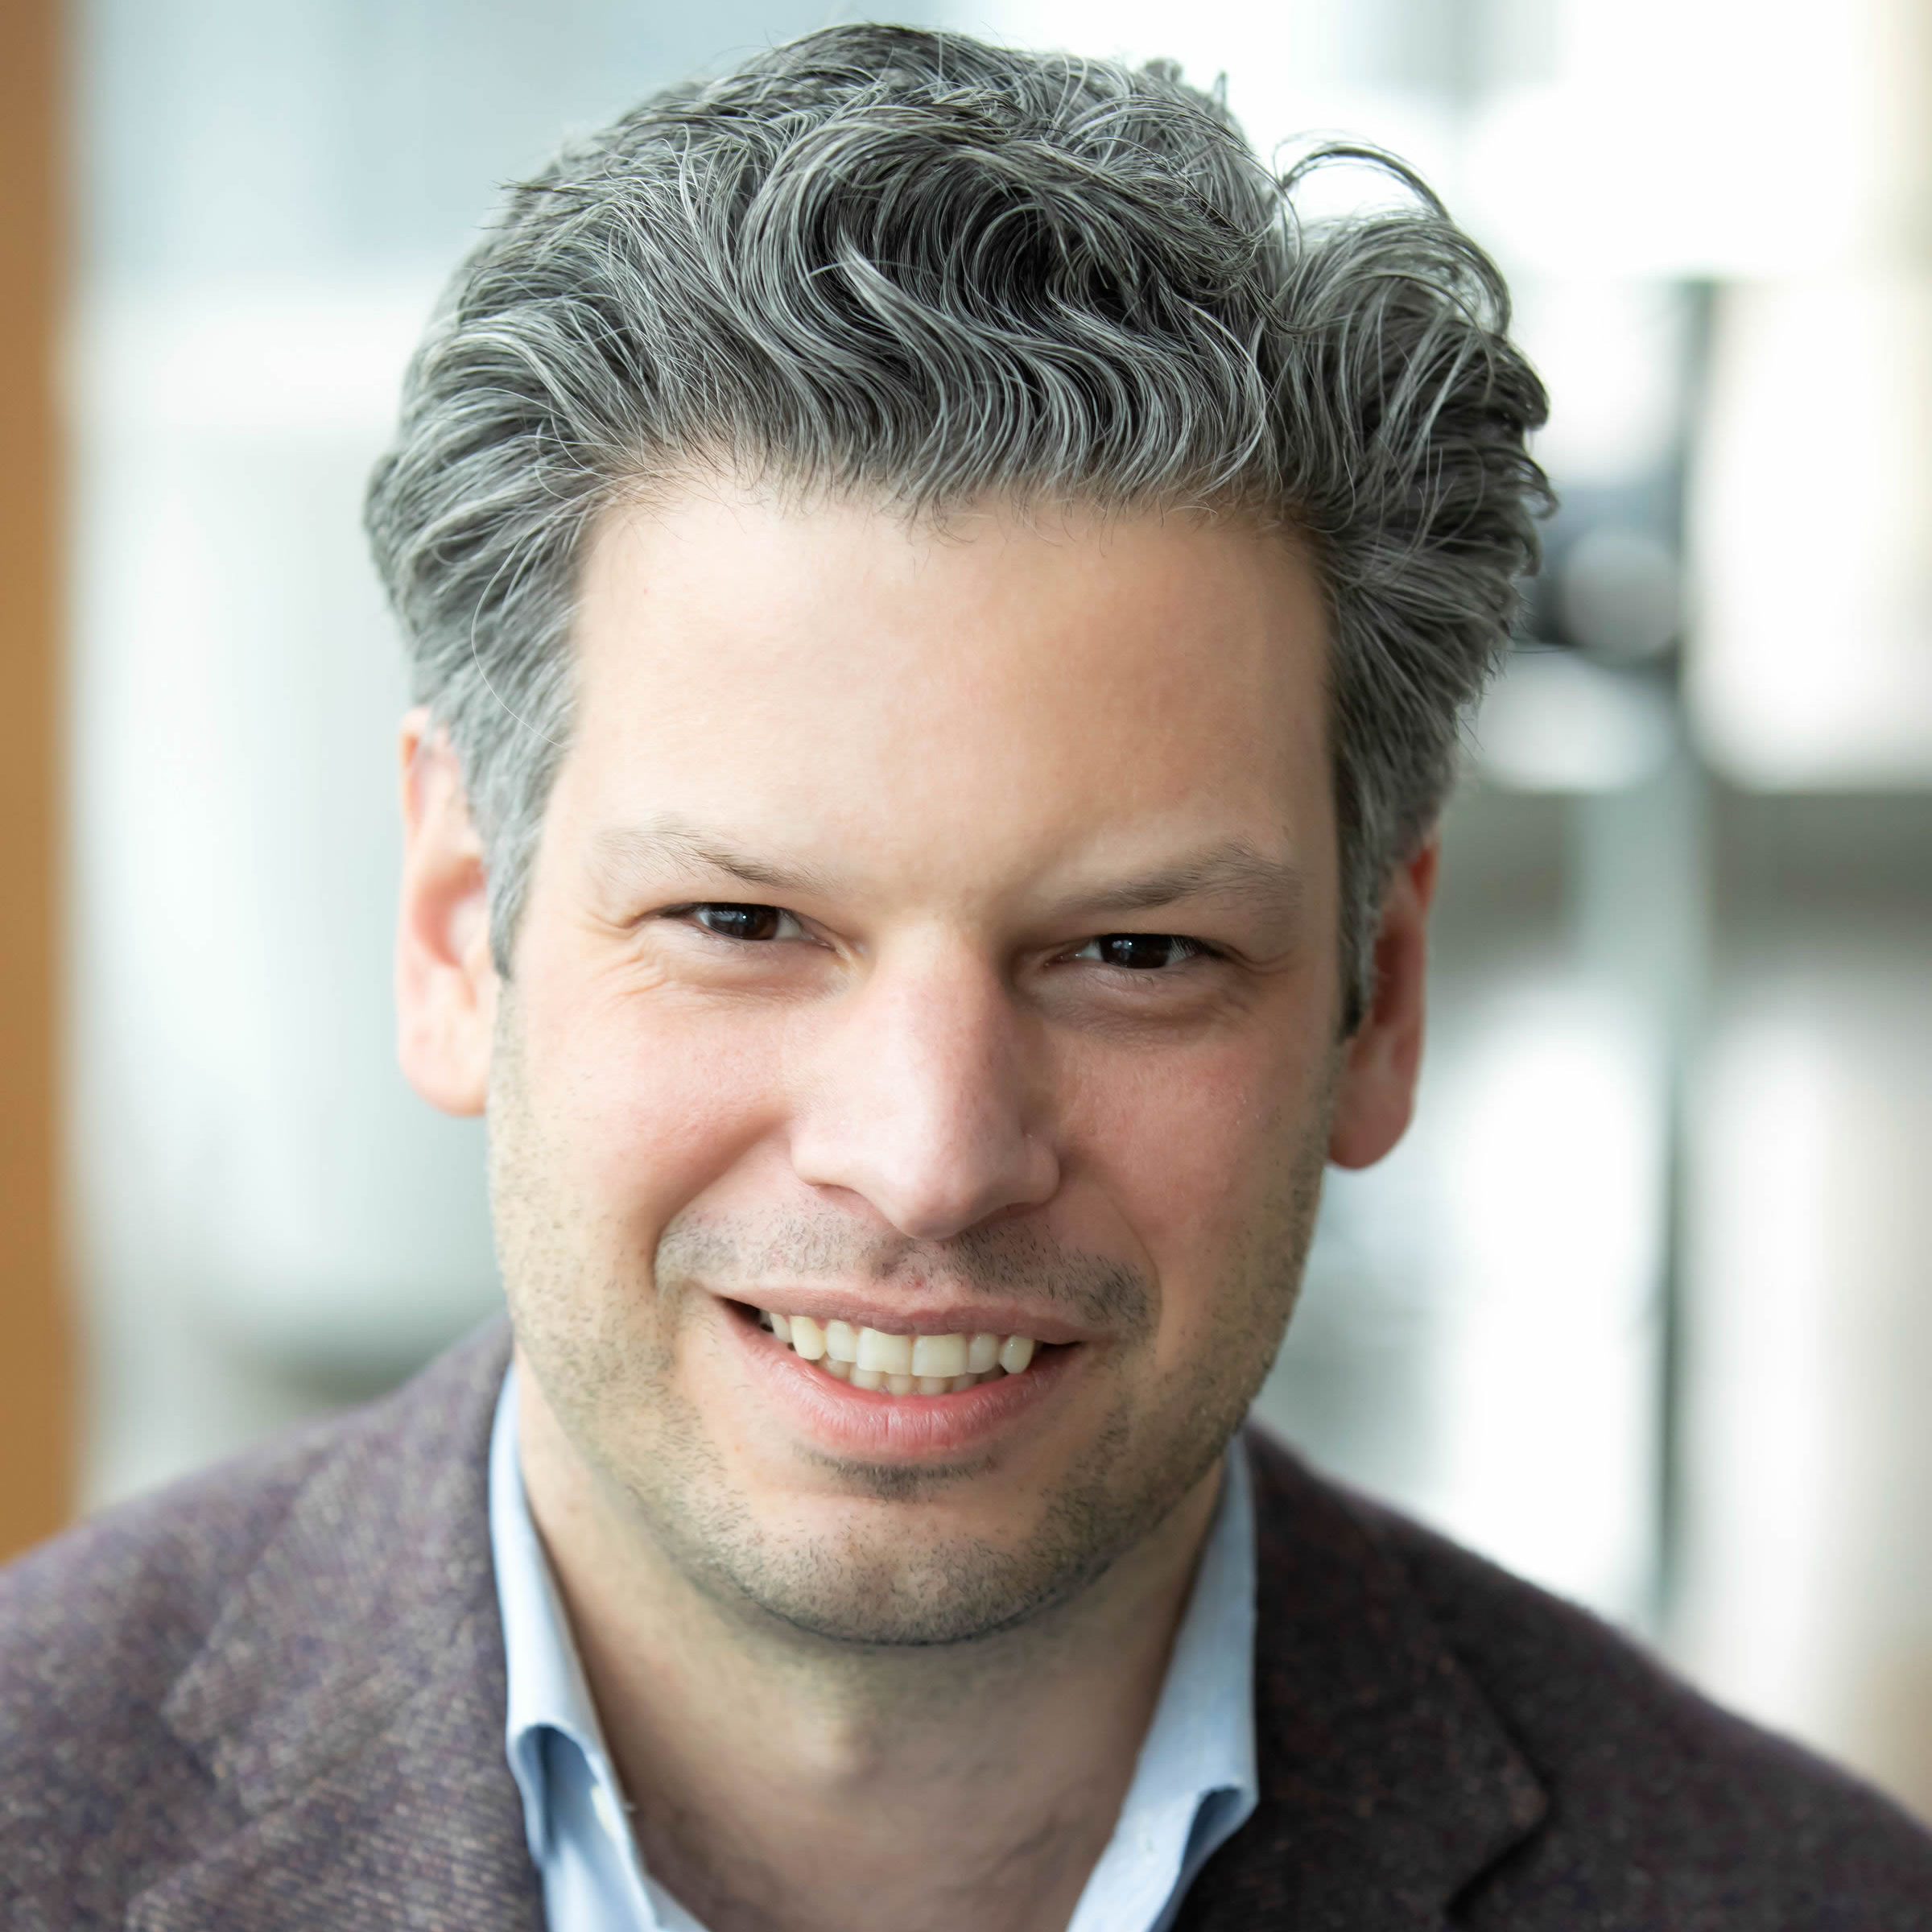 Keywan Rasekhschaffe, Senior Quantitative Strategist and Portfolio Manager at Gresham Investment Management